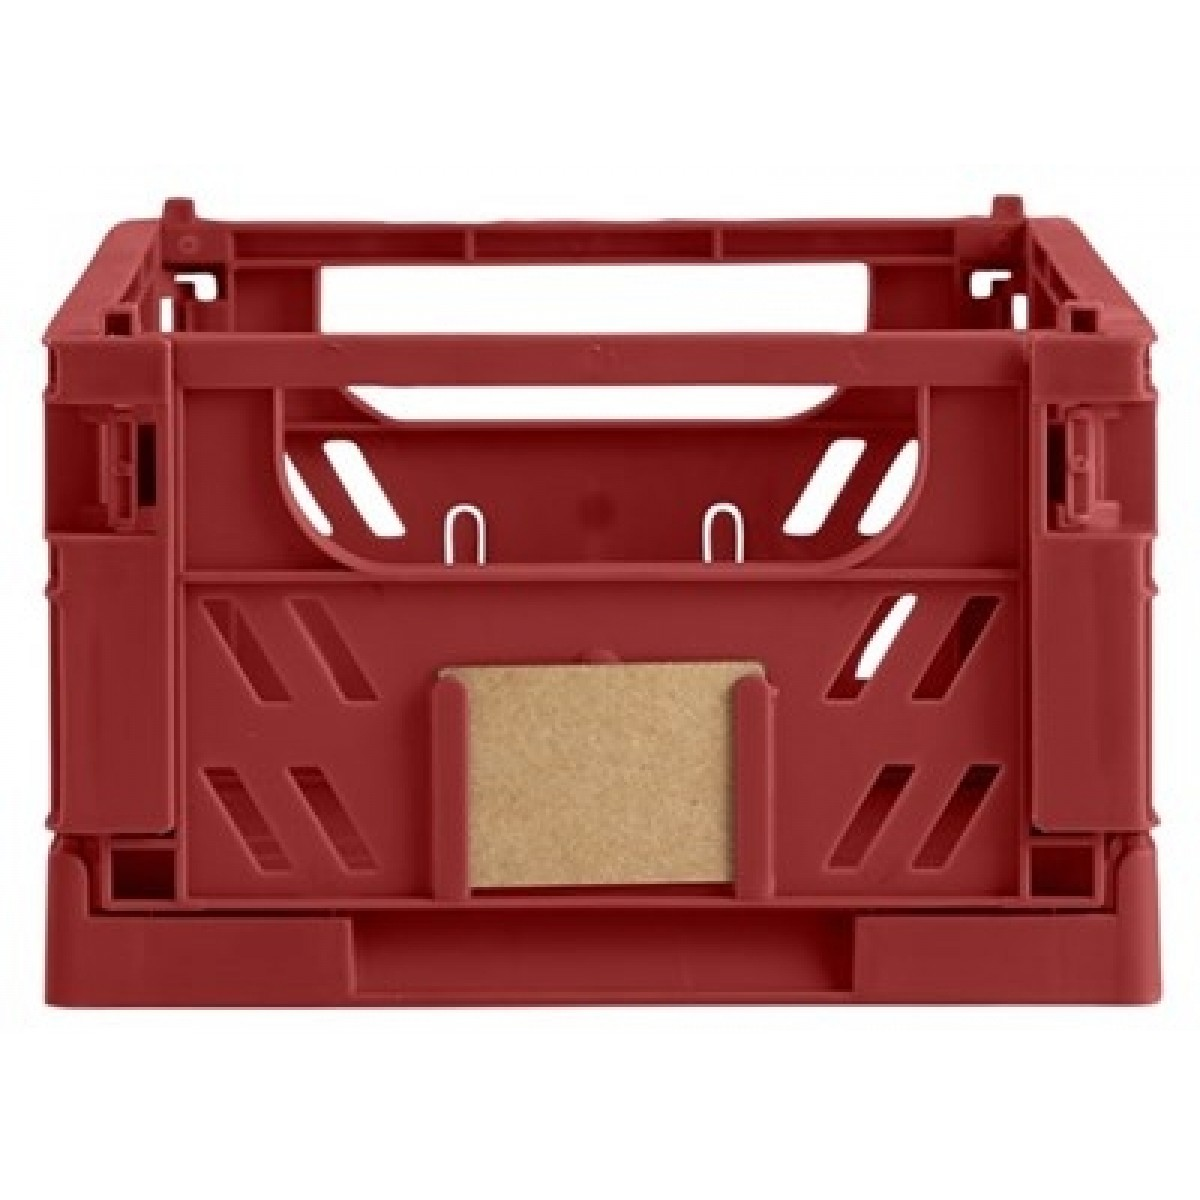 DAY Opbevaringskasse foldbar 25x16,5x10 cm ochre red